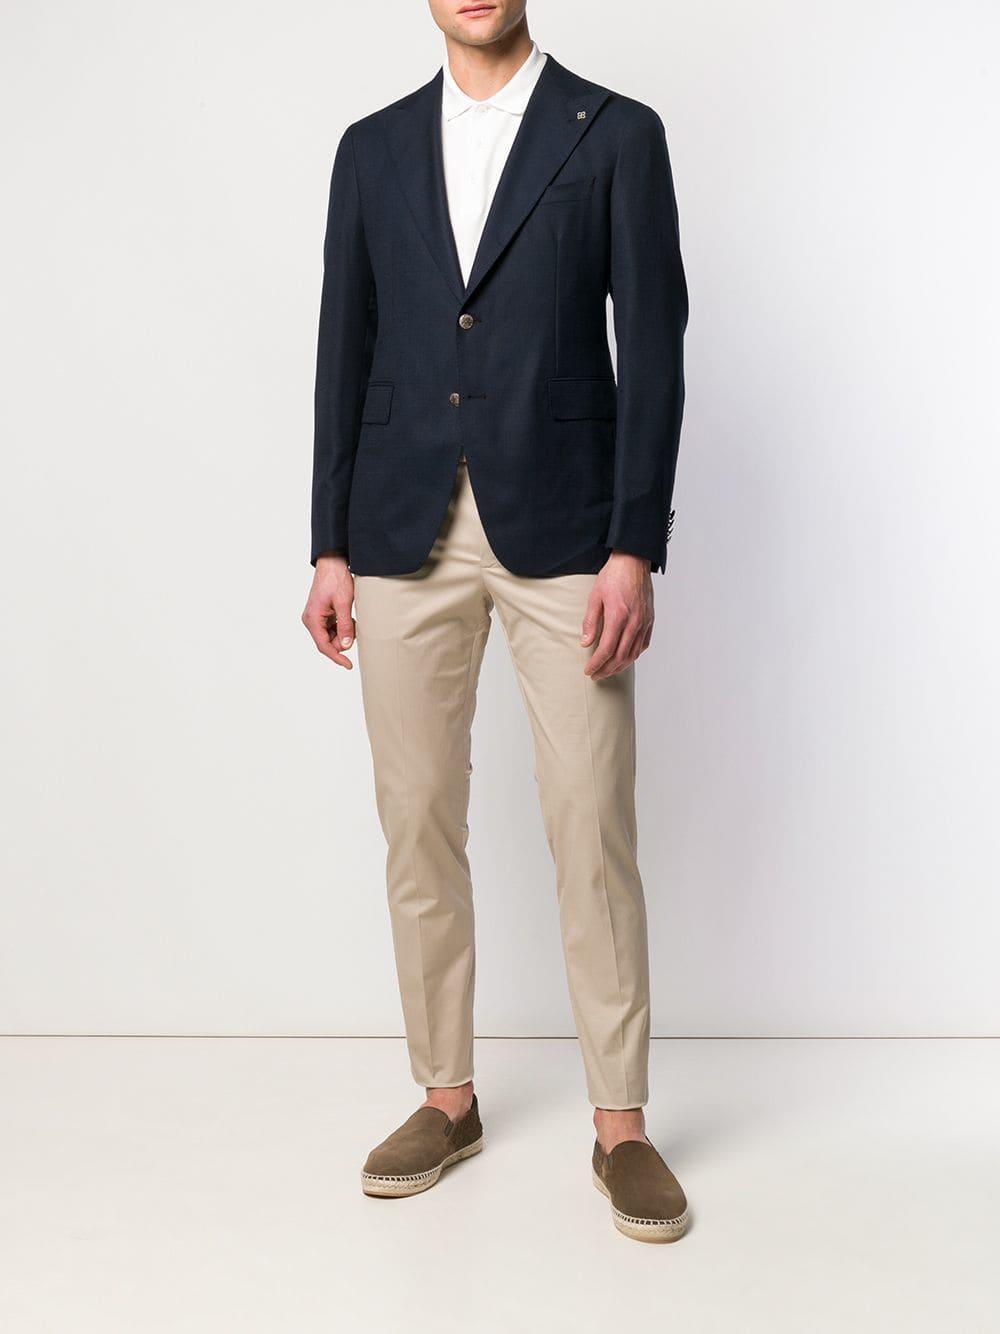 1f83c9856550 Lyst - Tagliatore Suit Jacket in Blue for Men